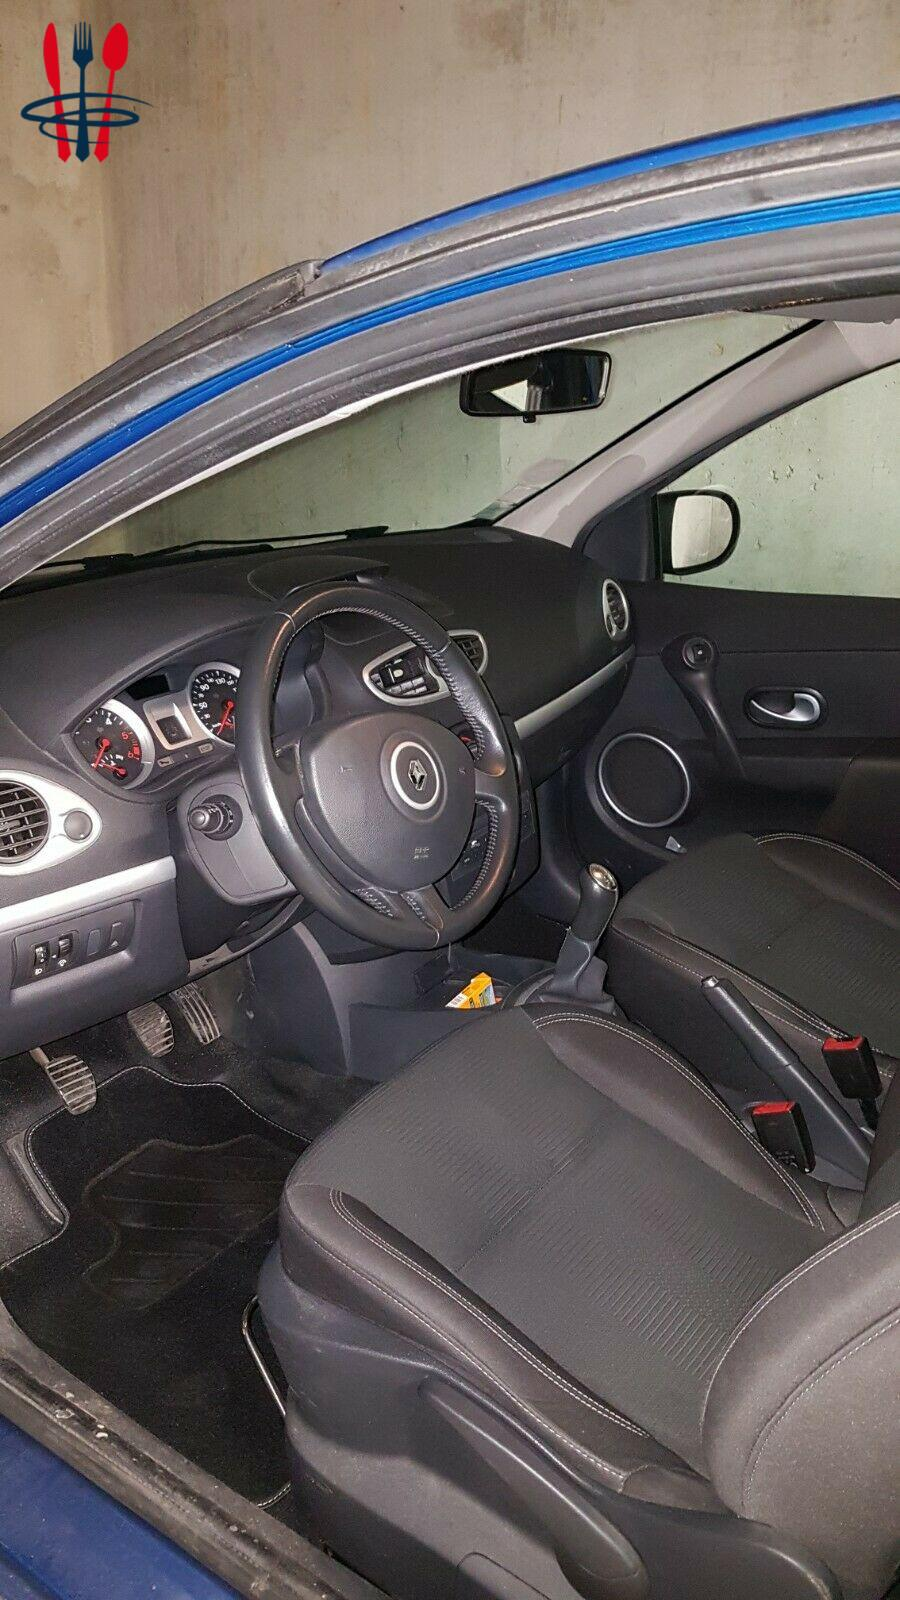 A vendre  Renault Clio3 (II) 1.5DCI 90CH